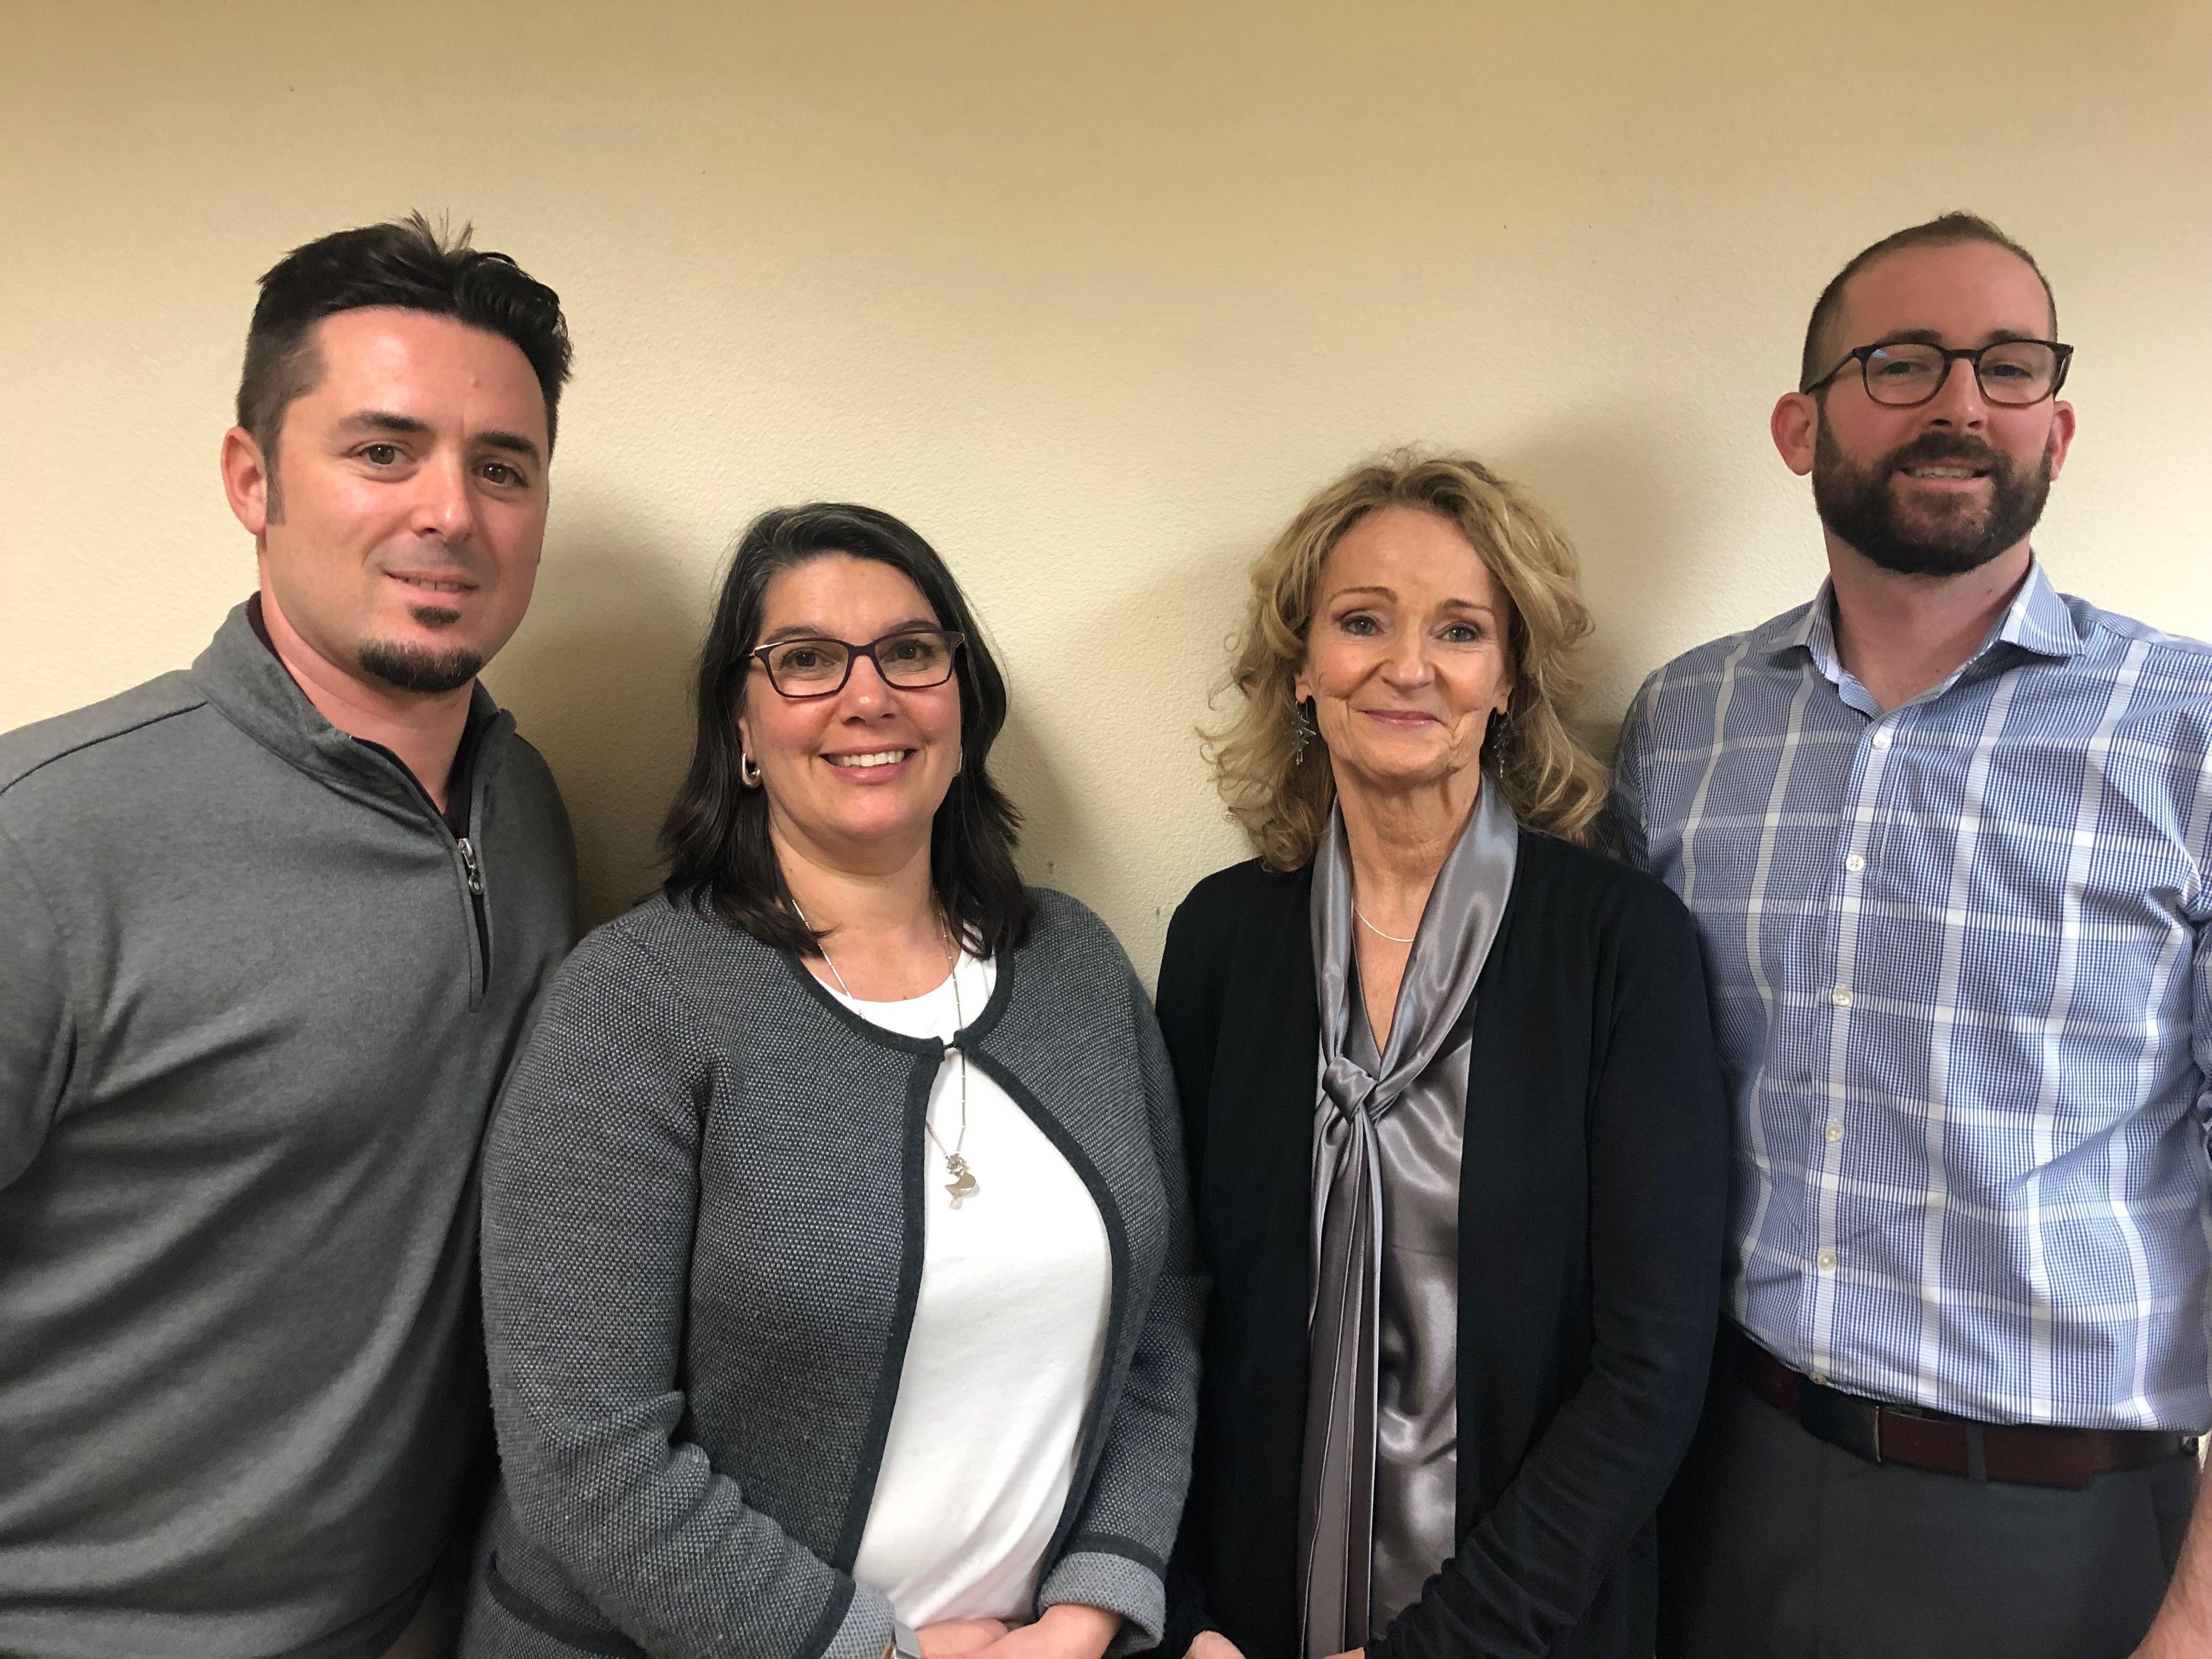 CASA Welcomes New Board Members